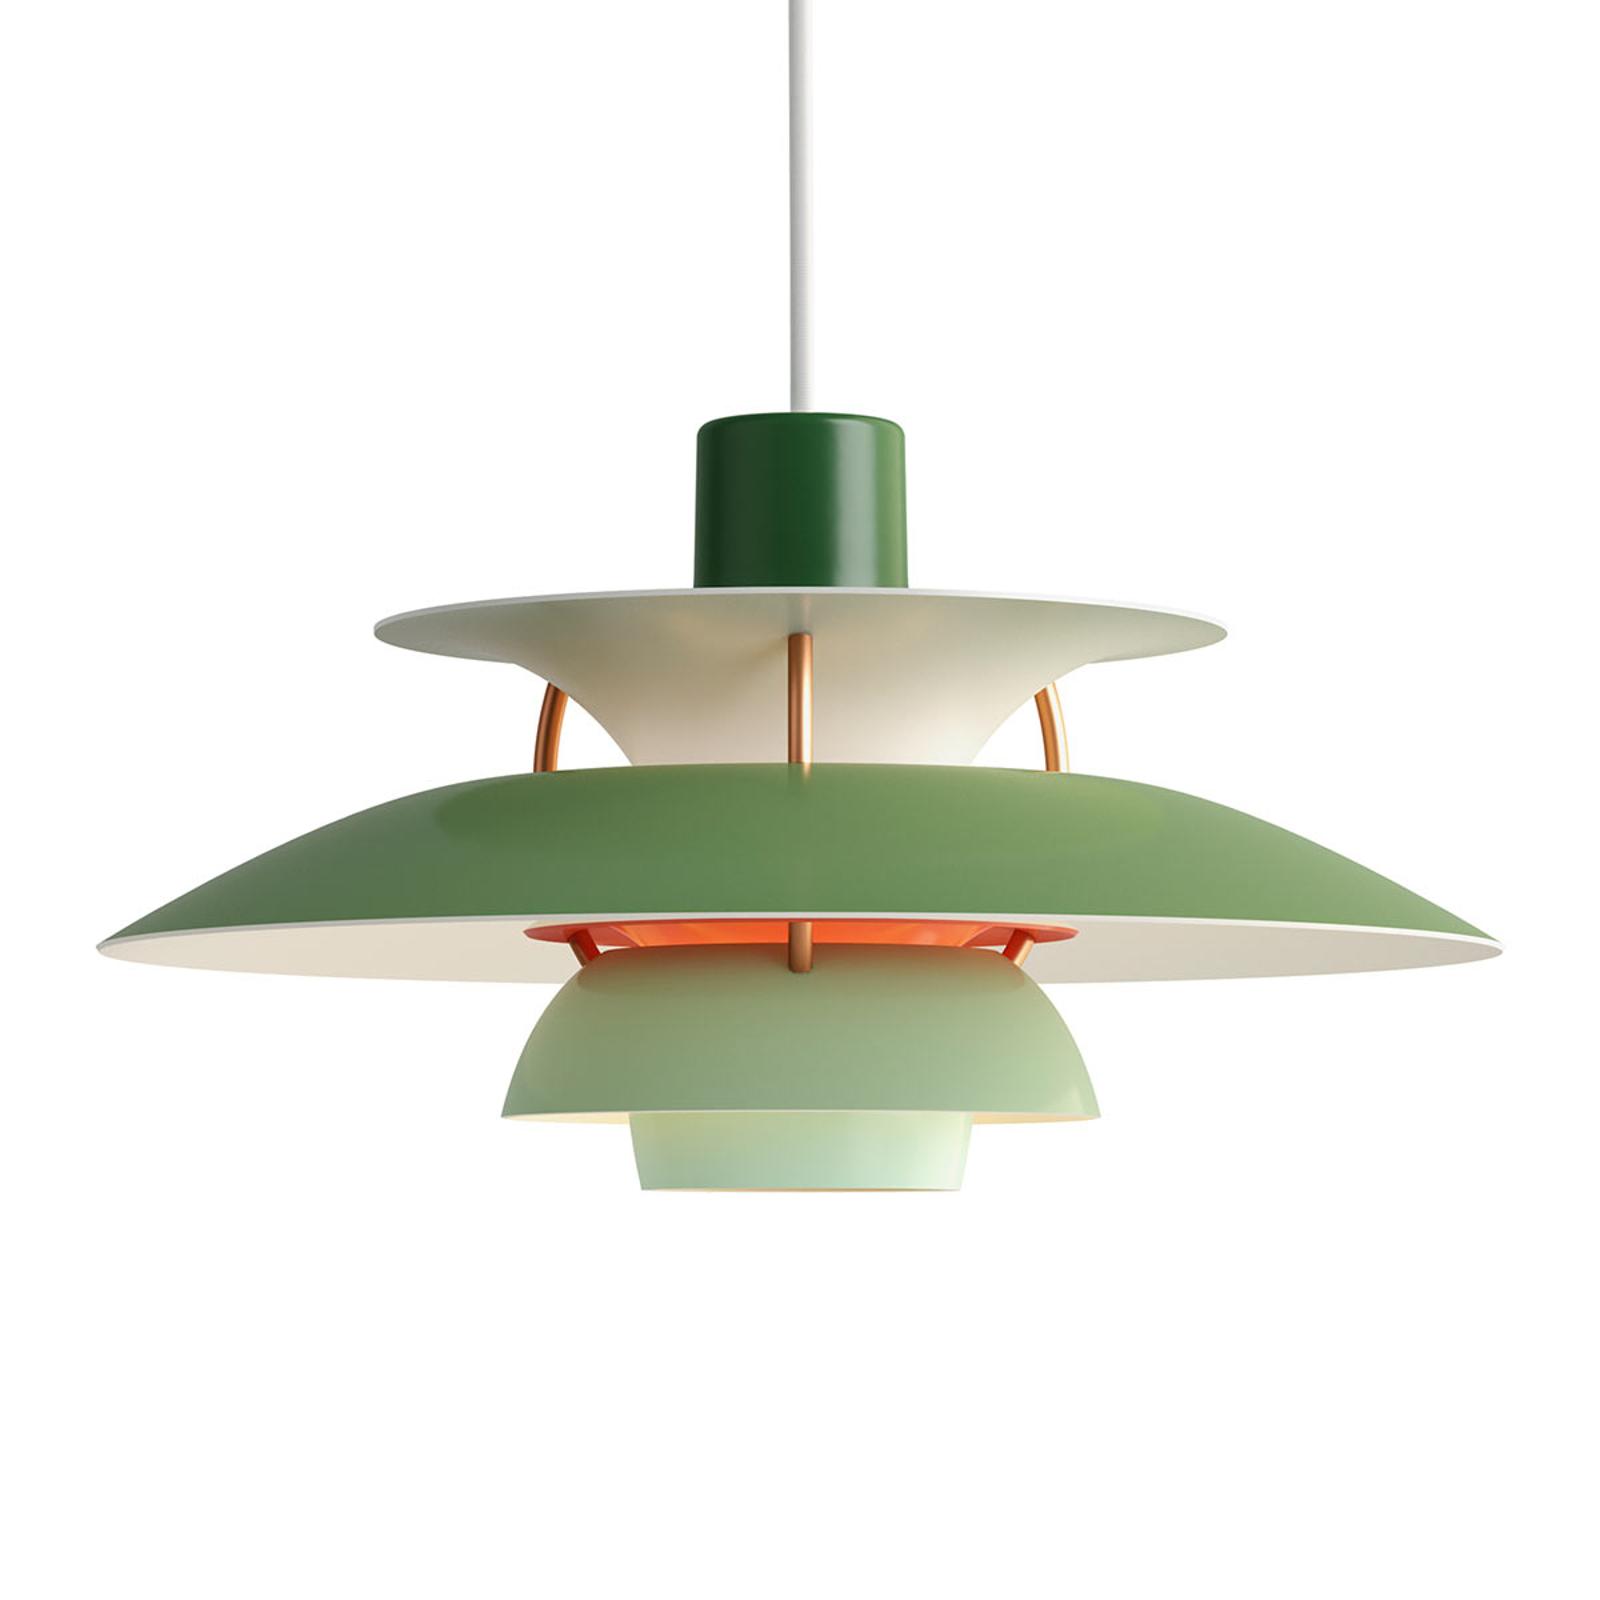 Louis Poulsen PH5Mini lampada a sospensione verde